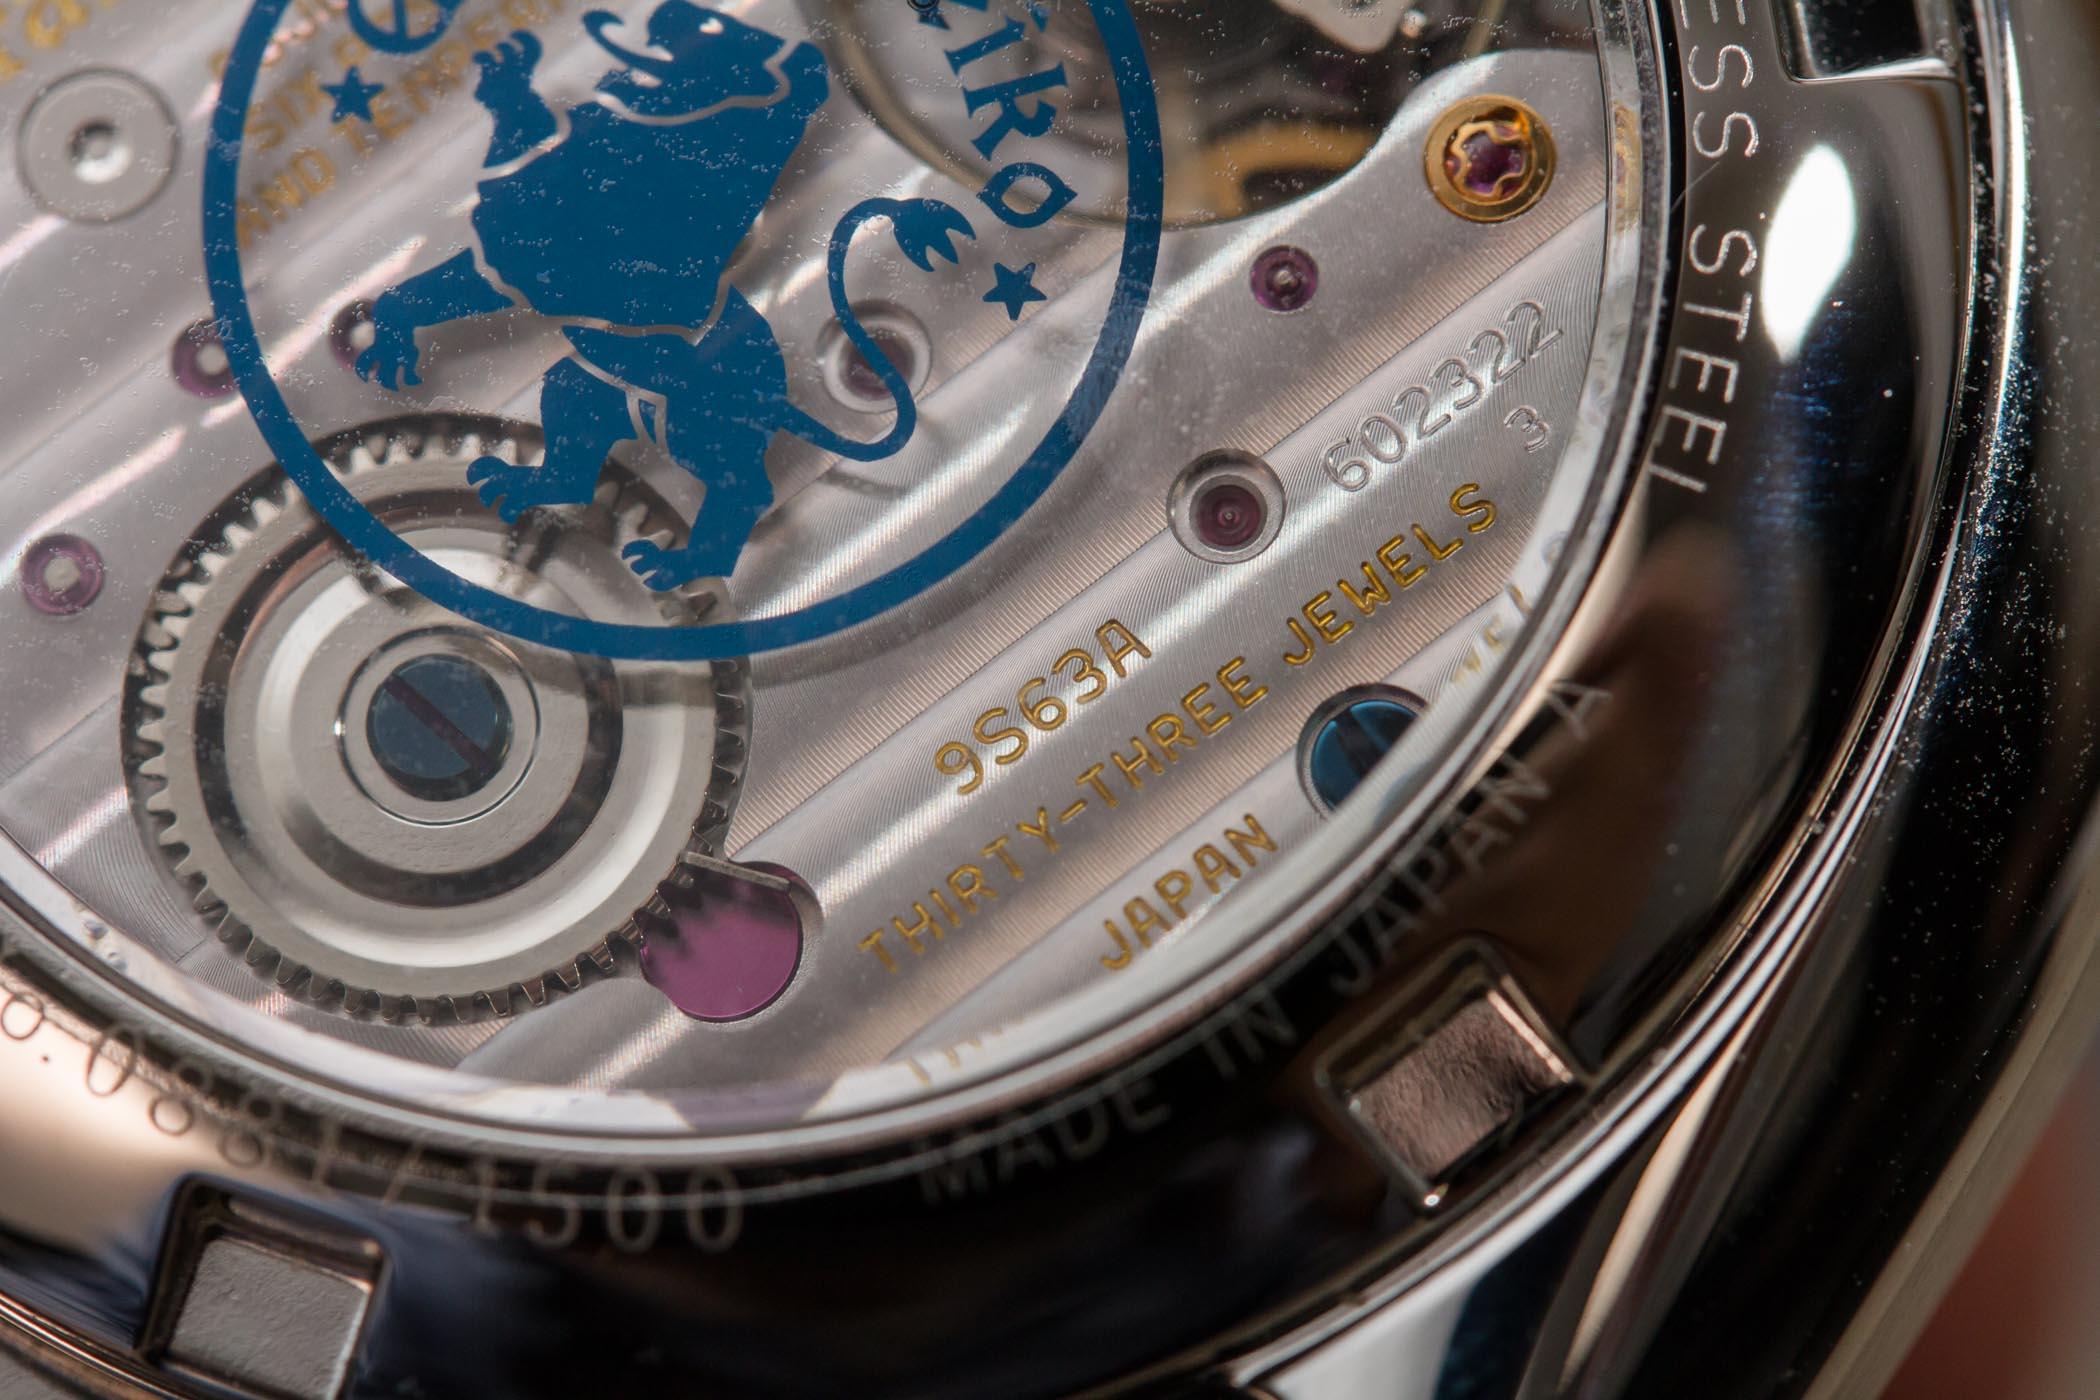 Grand Seiko Elegance Limited Edition Steel SBGK005G